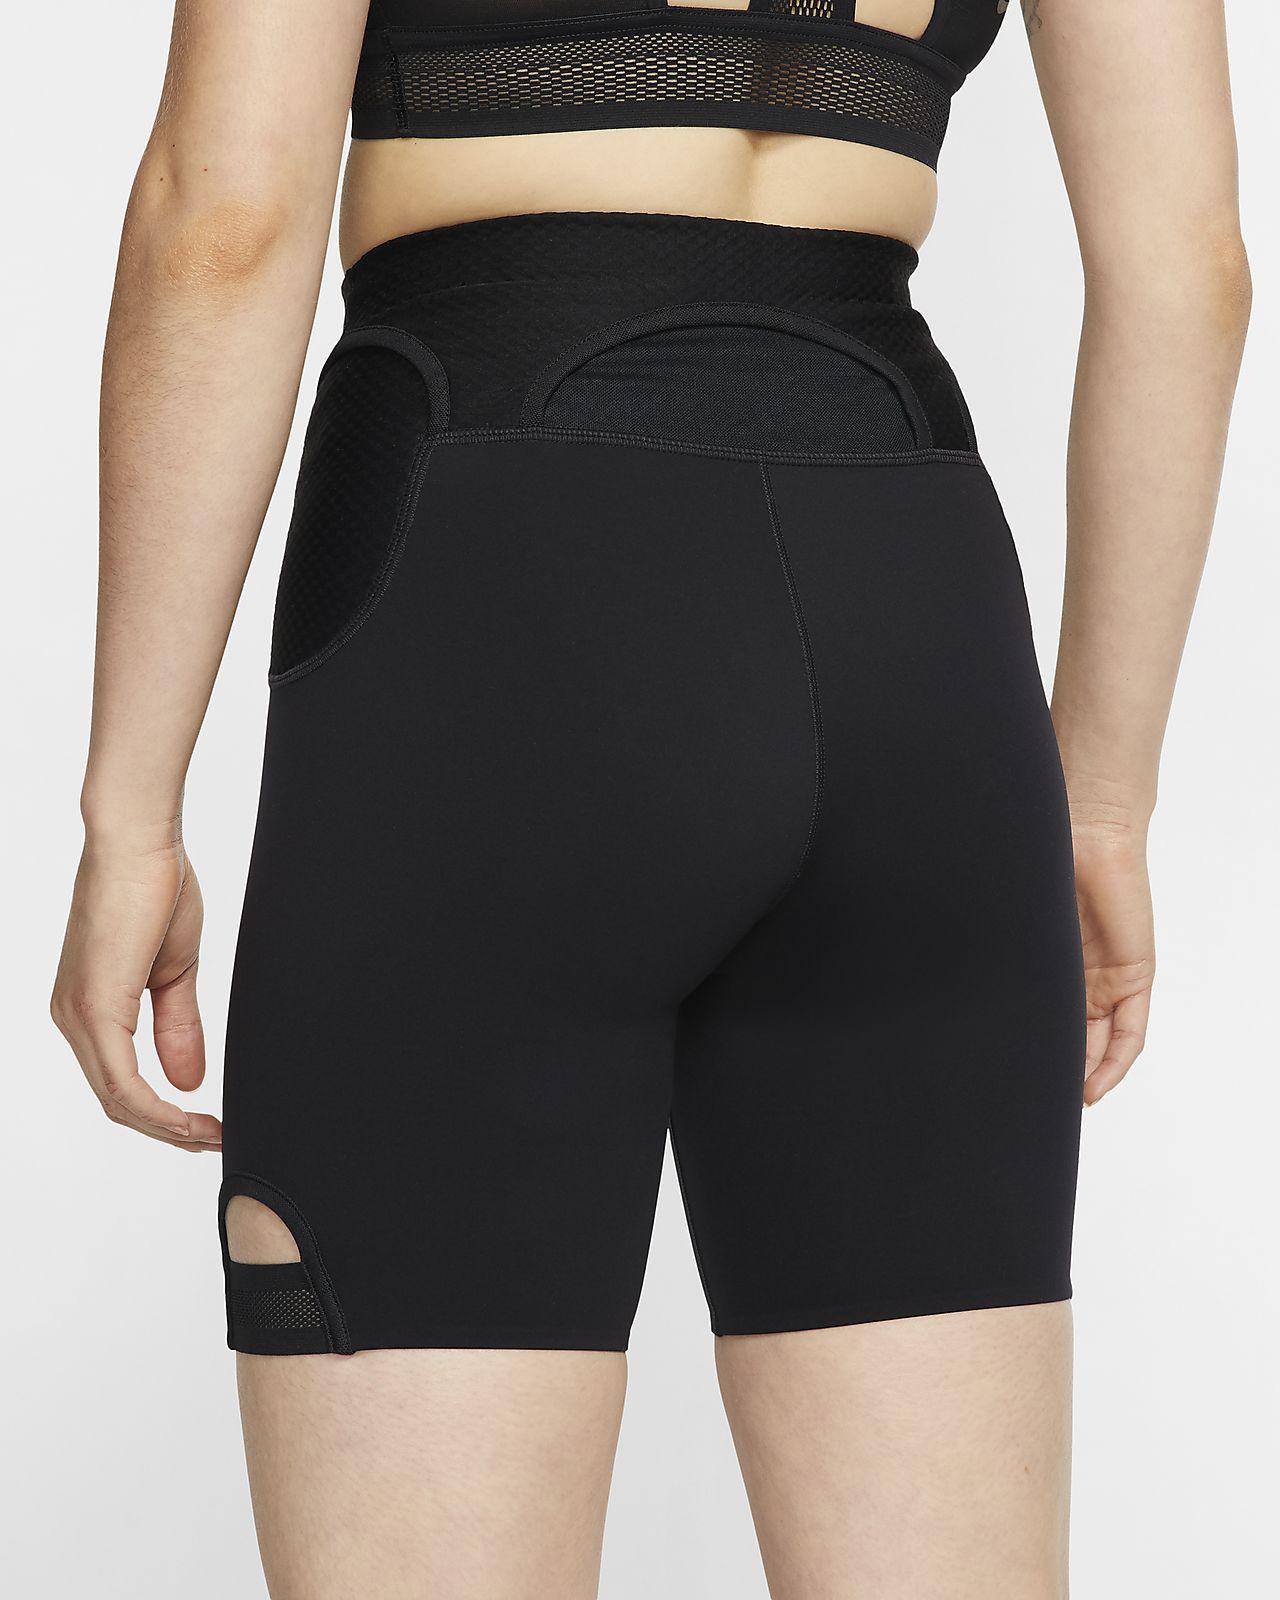 Nike City Ready Hardloopshorts voor dames (18 cm)